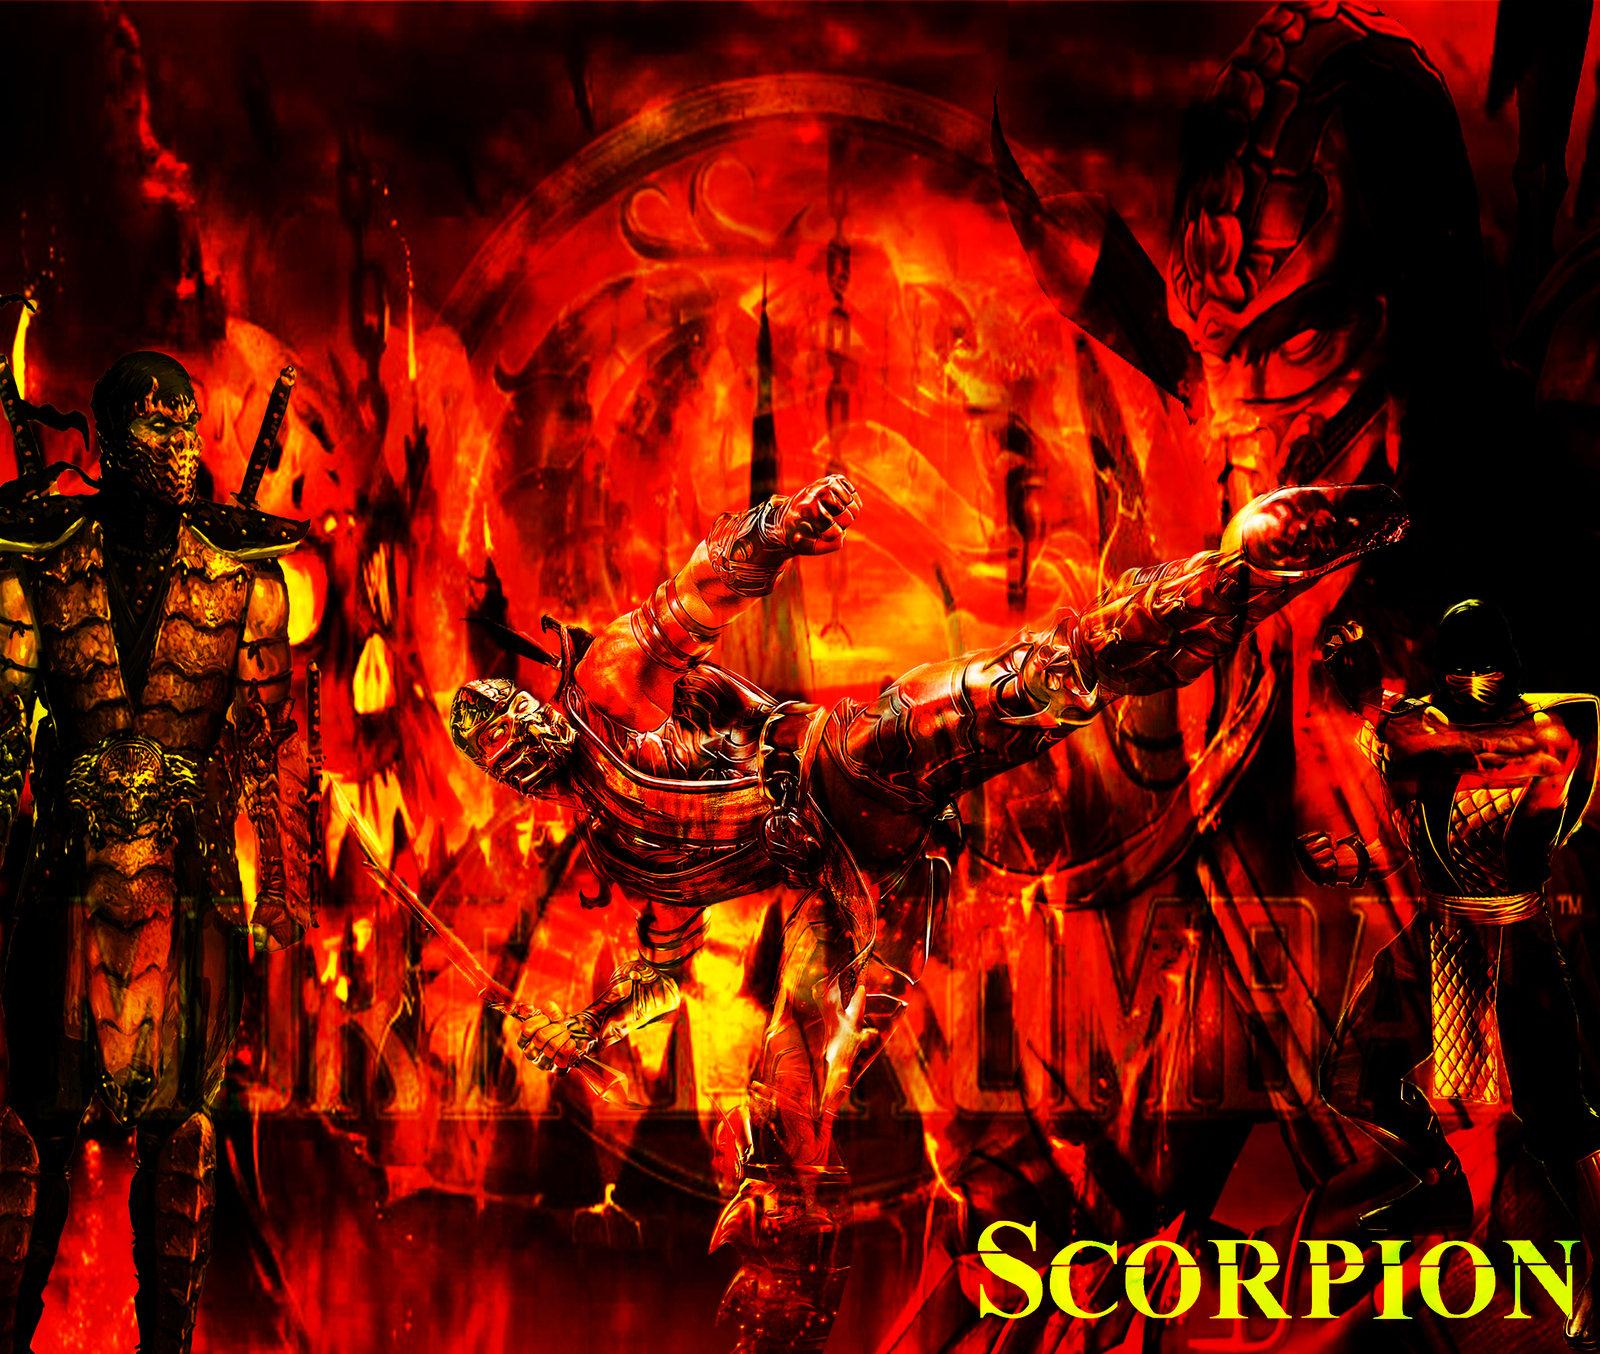 Mortal Kombat 9 Scorpion Wallpapers 1600x1354